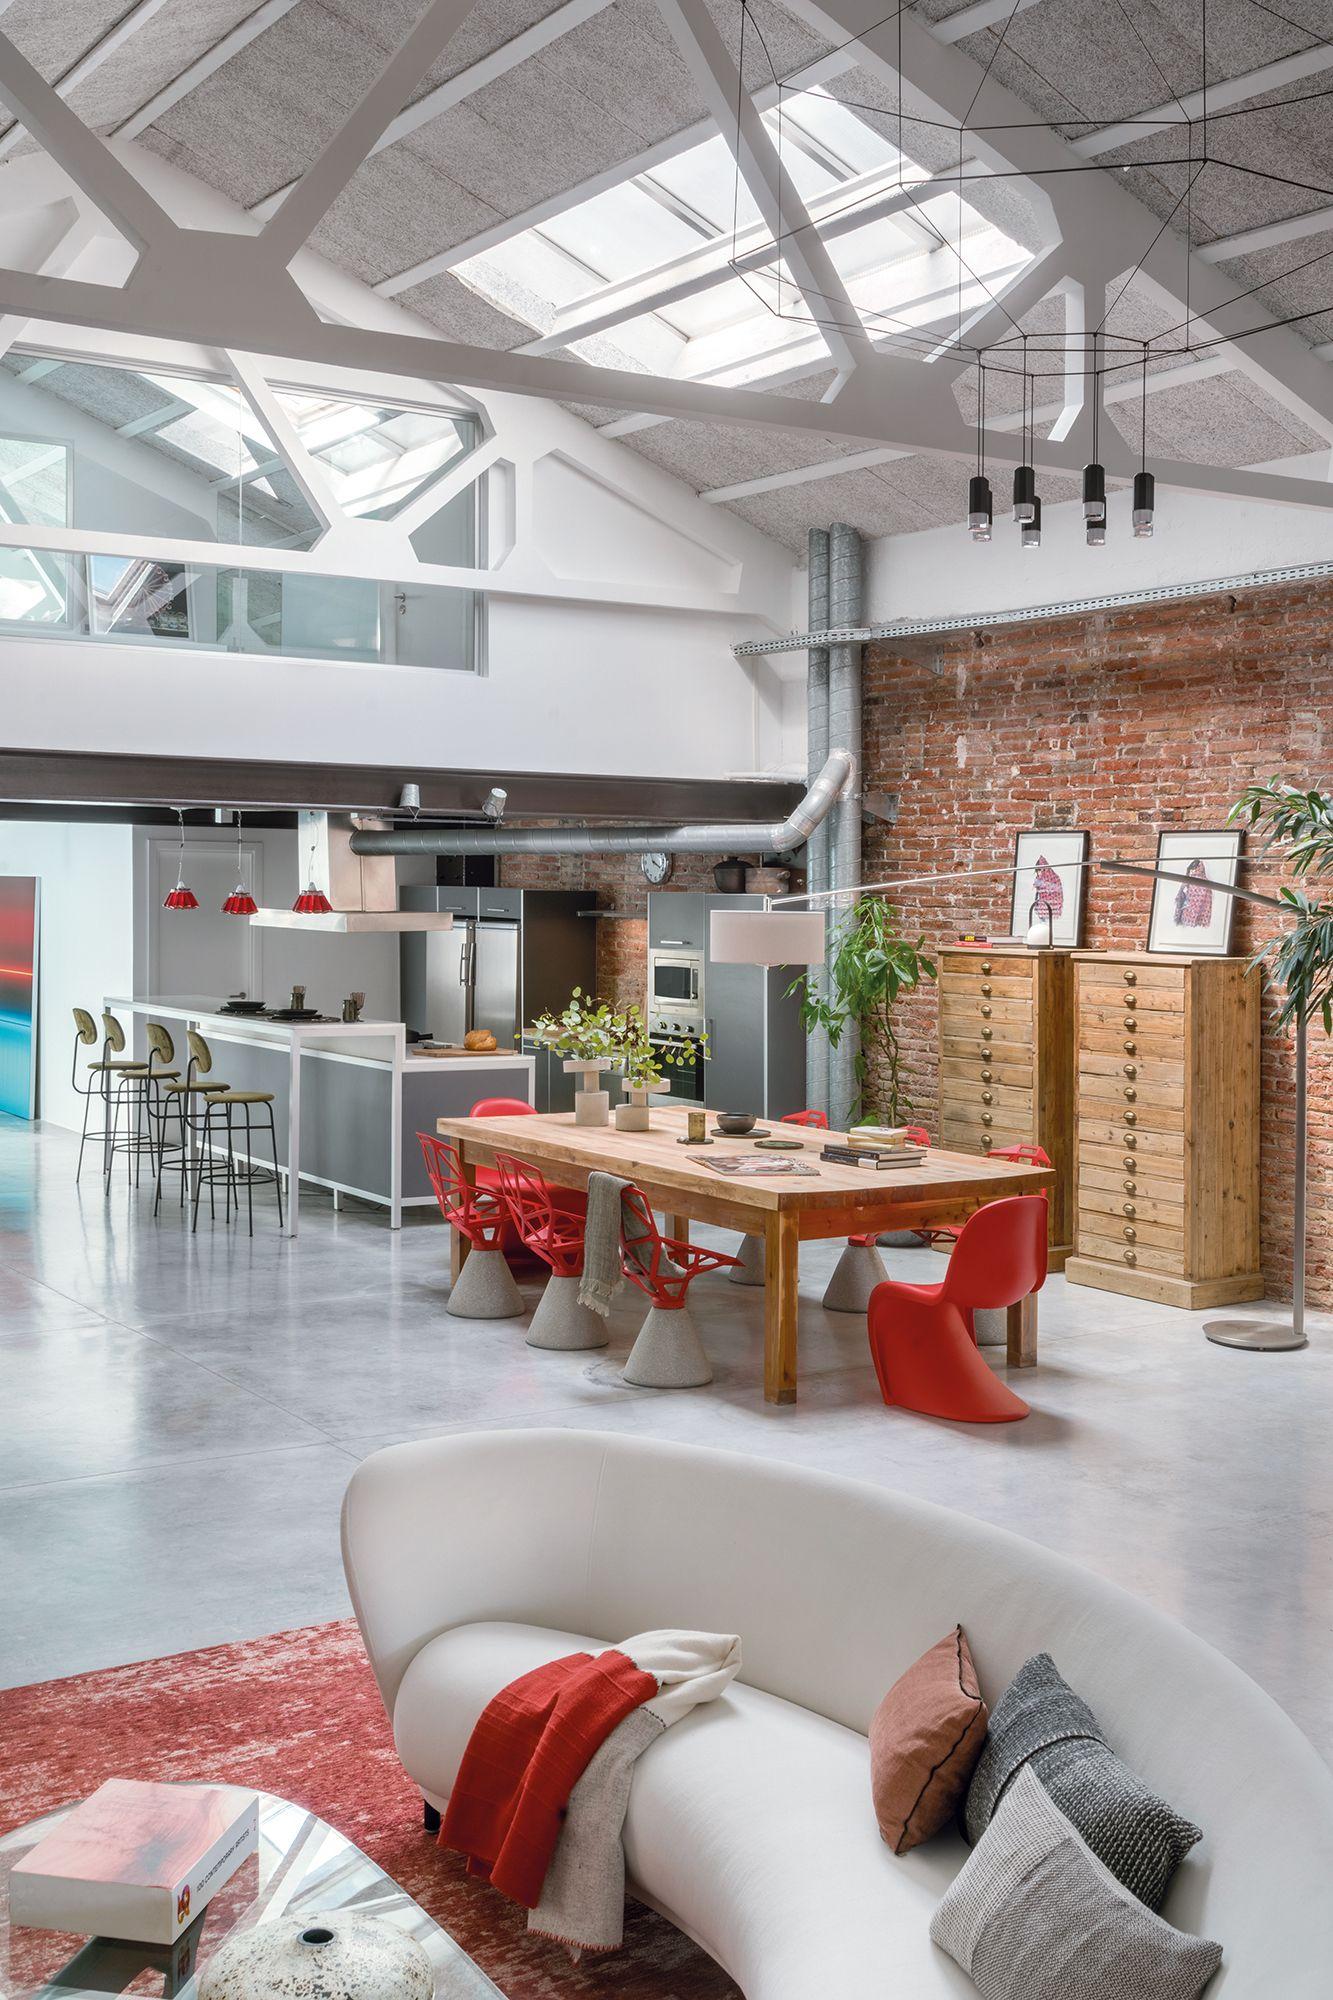 Home Tour: A Loft Apartment In Barcelona That Doubles As An Art Venue